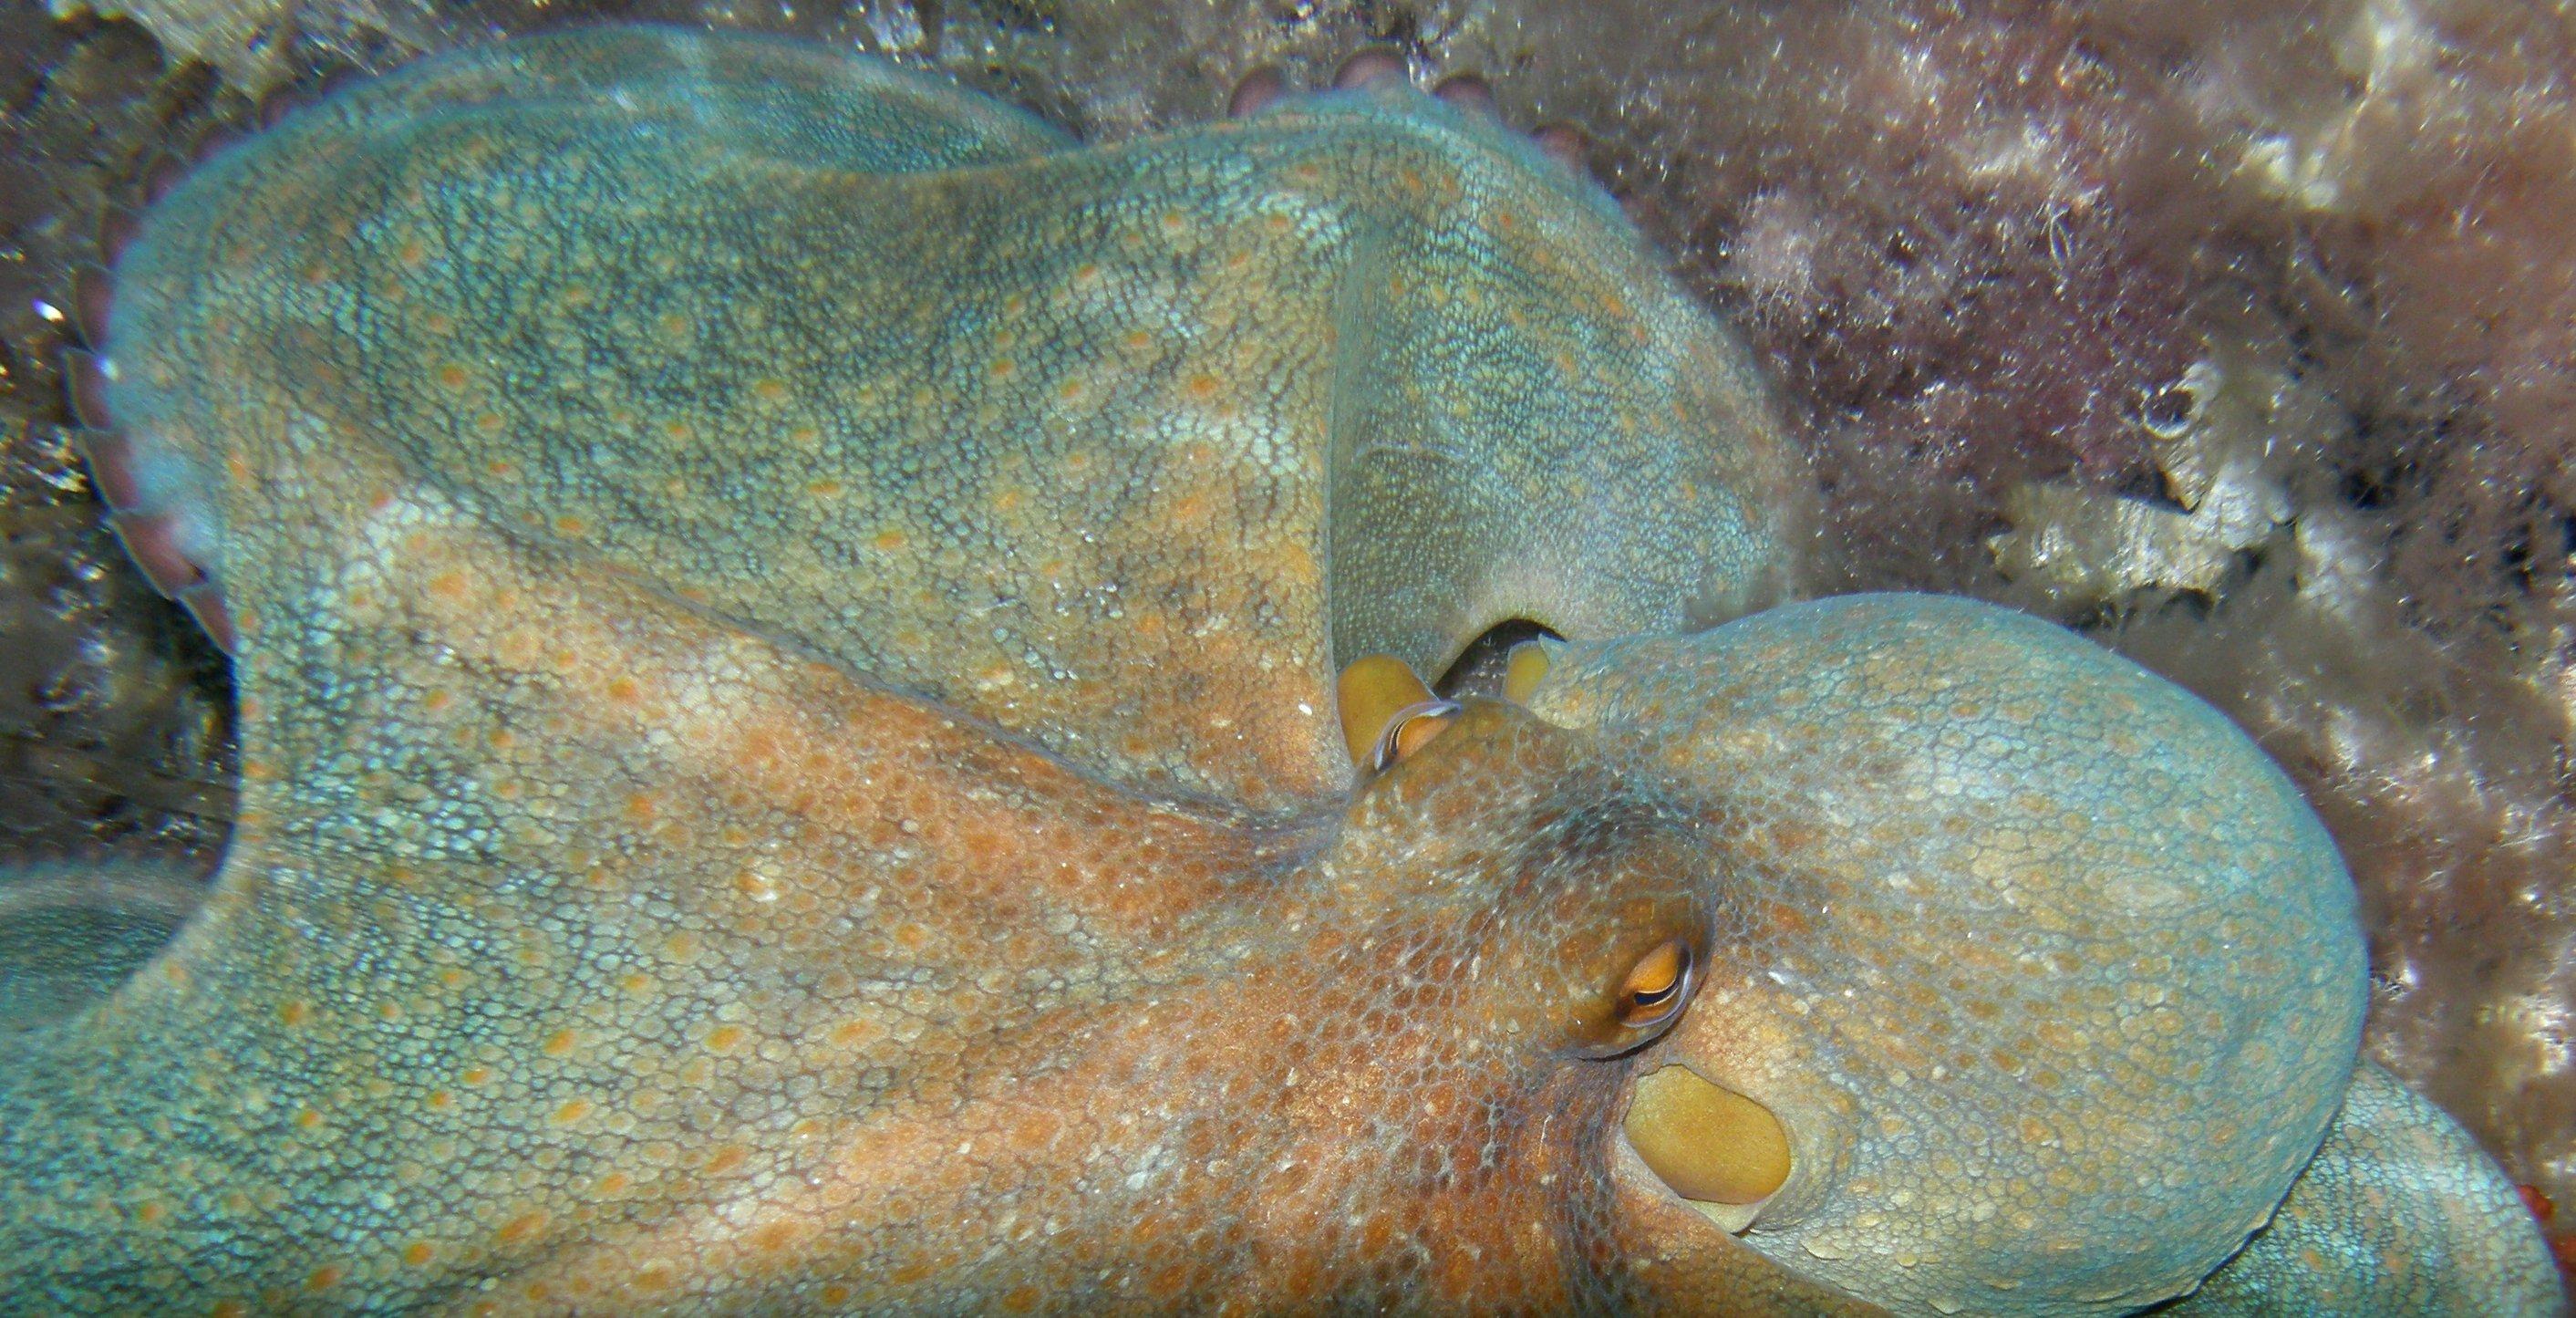 8-armet blæksprutte i Middelhavet.